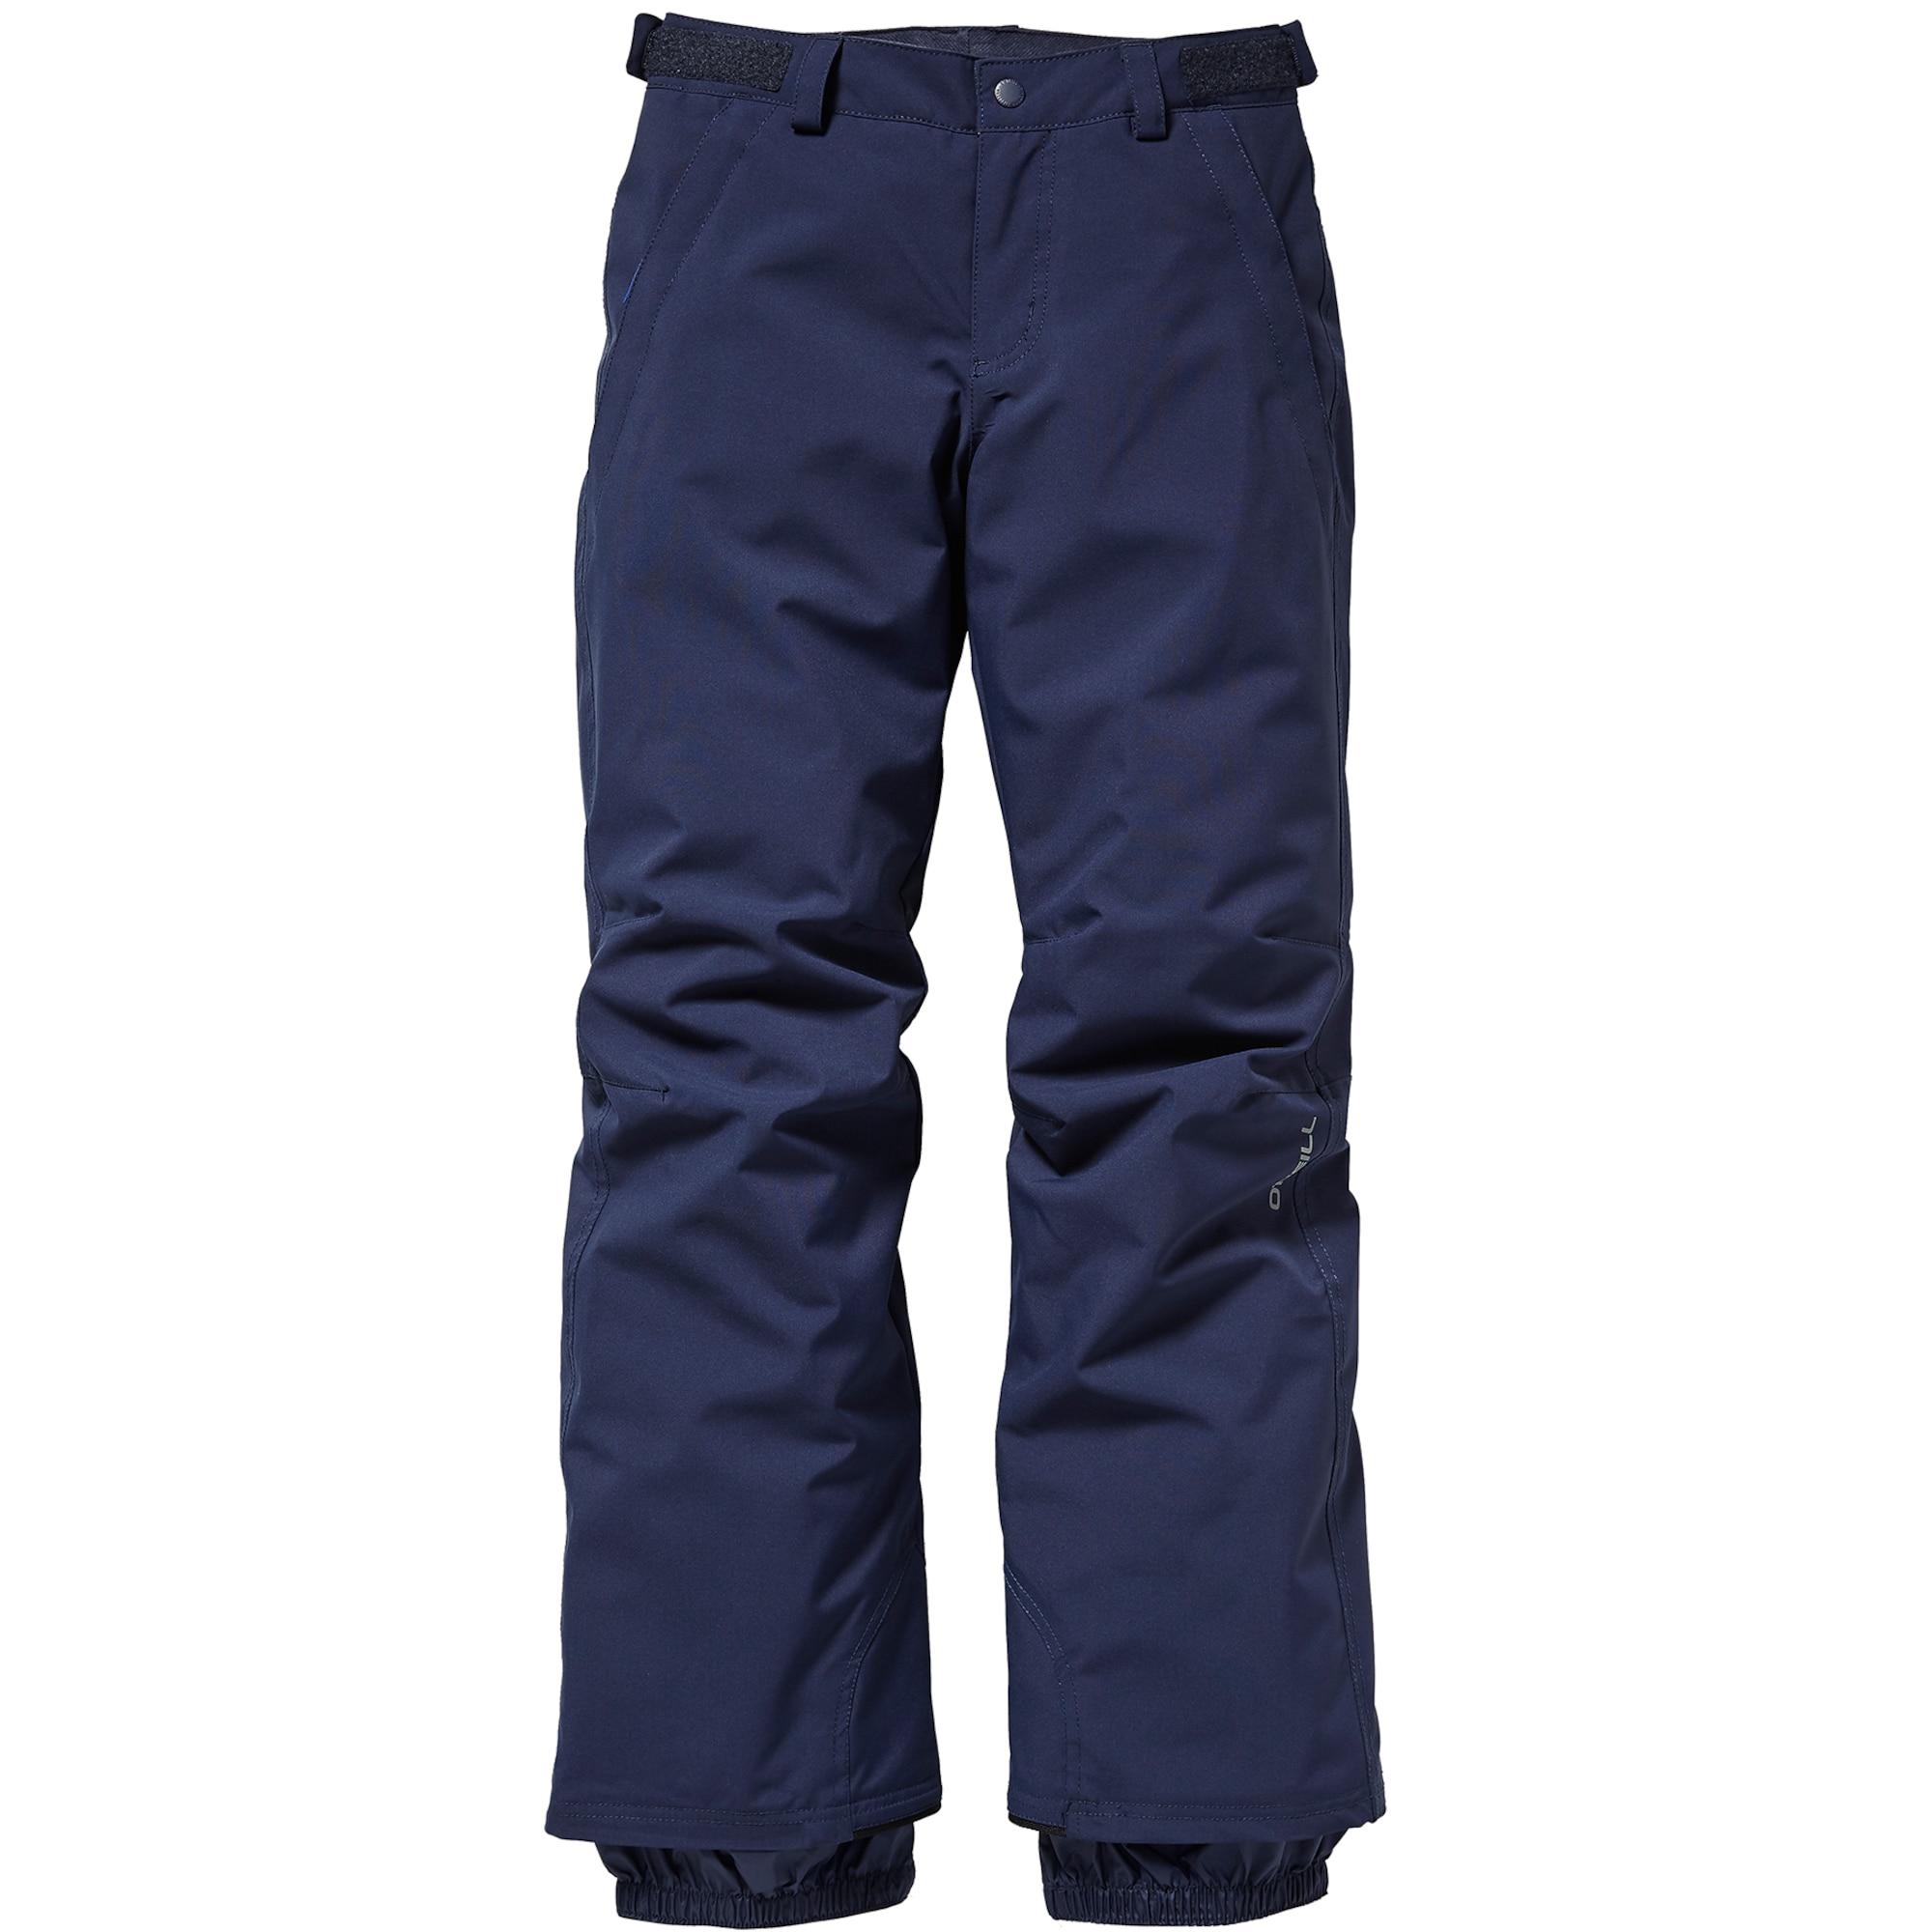 ONEILL Outodoor kalhoty Pb Anvil námořnická modř O'NEILL